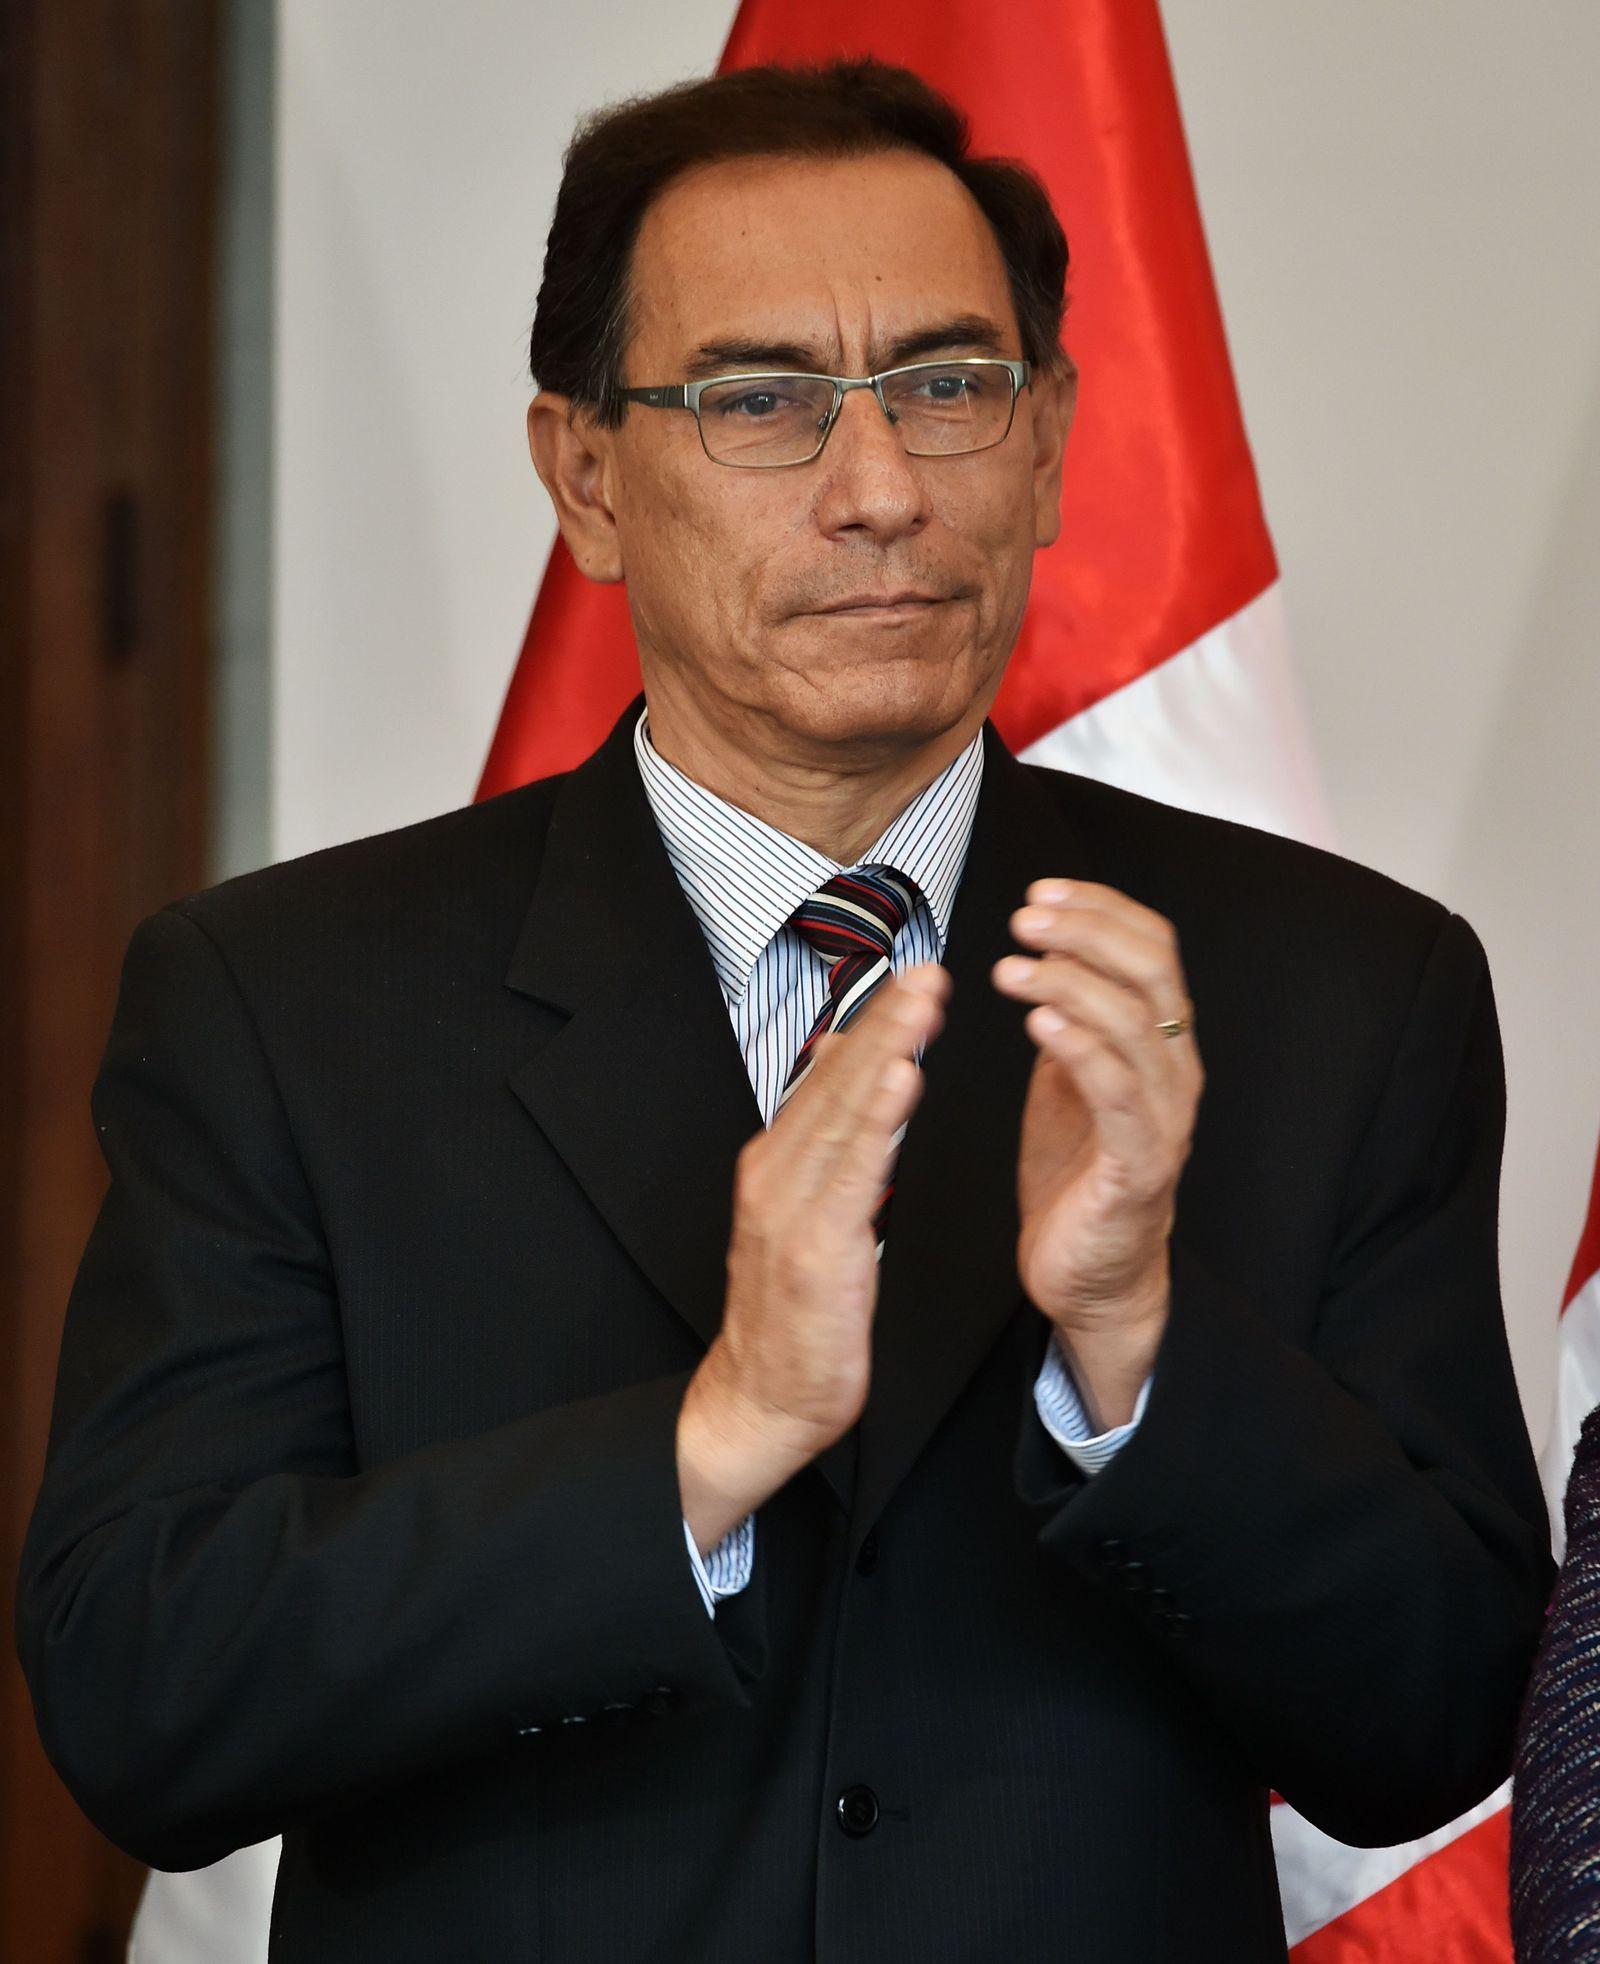 FILES-PERU-KUCZYNSKI-RESIGNATION-VIZCARRA